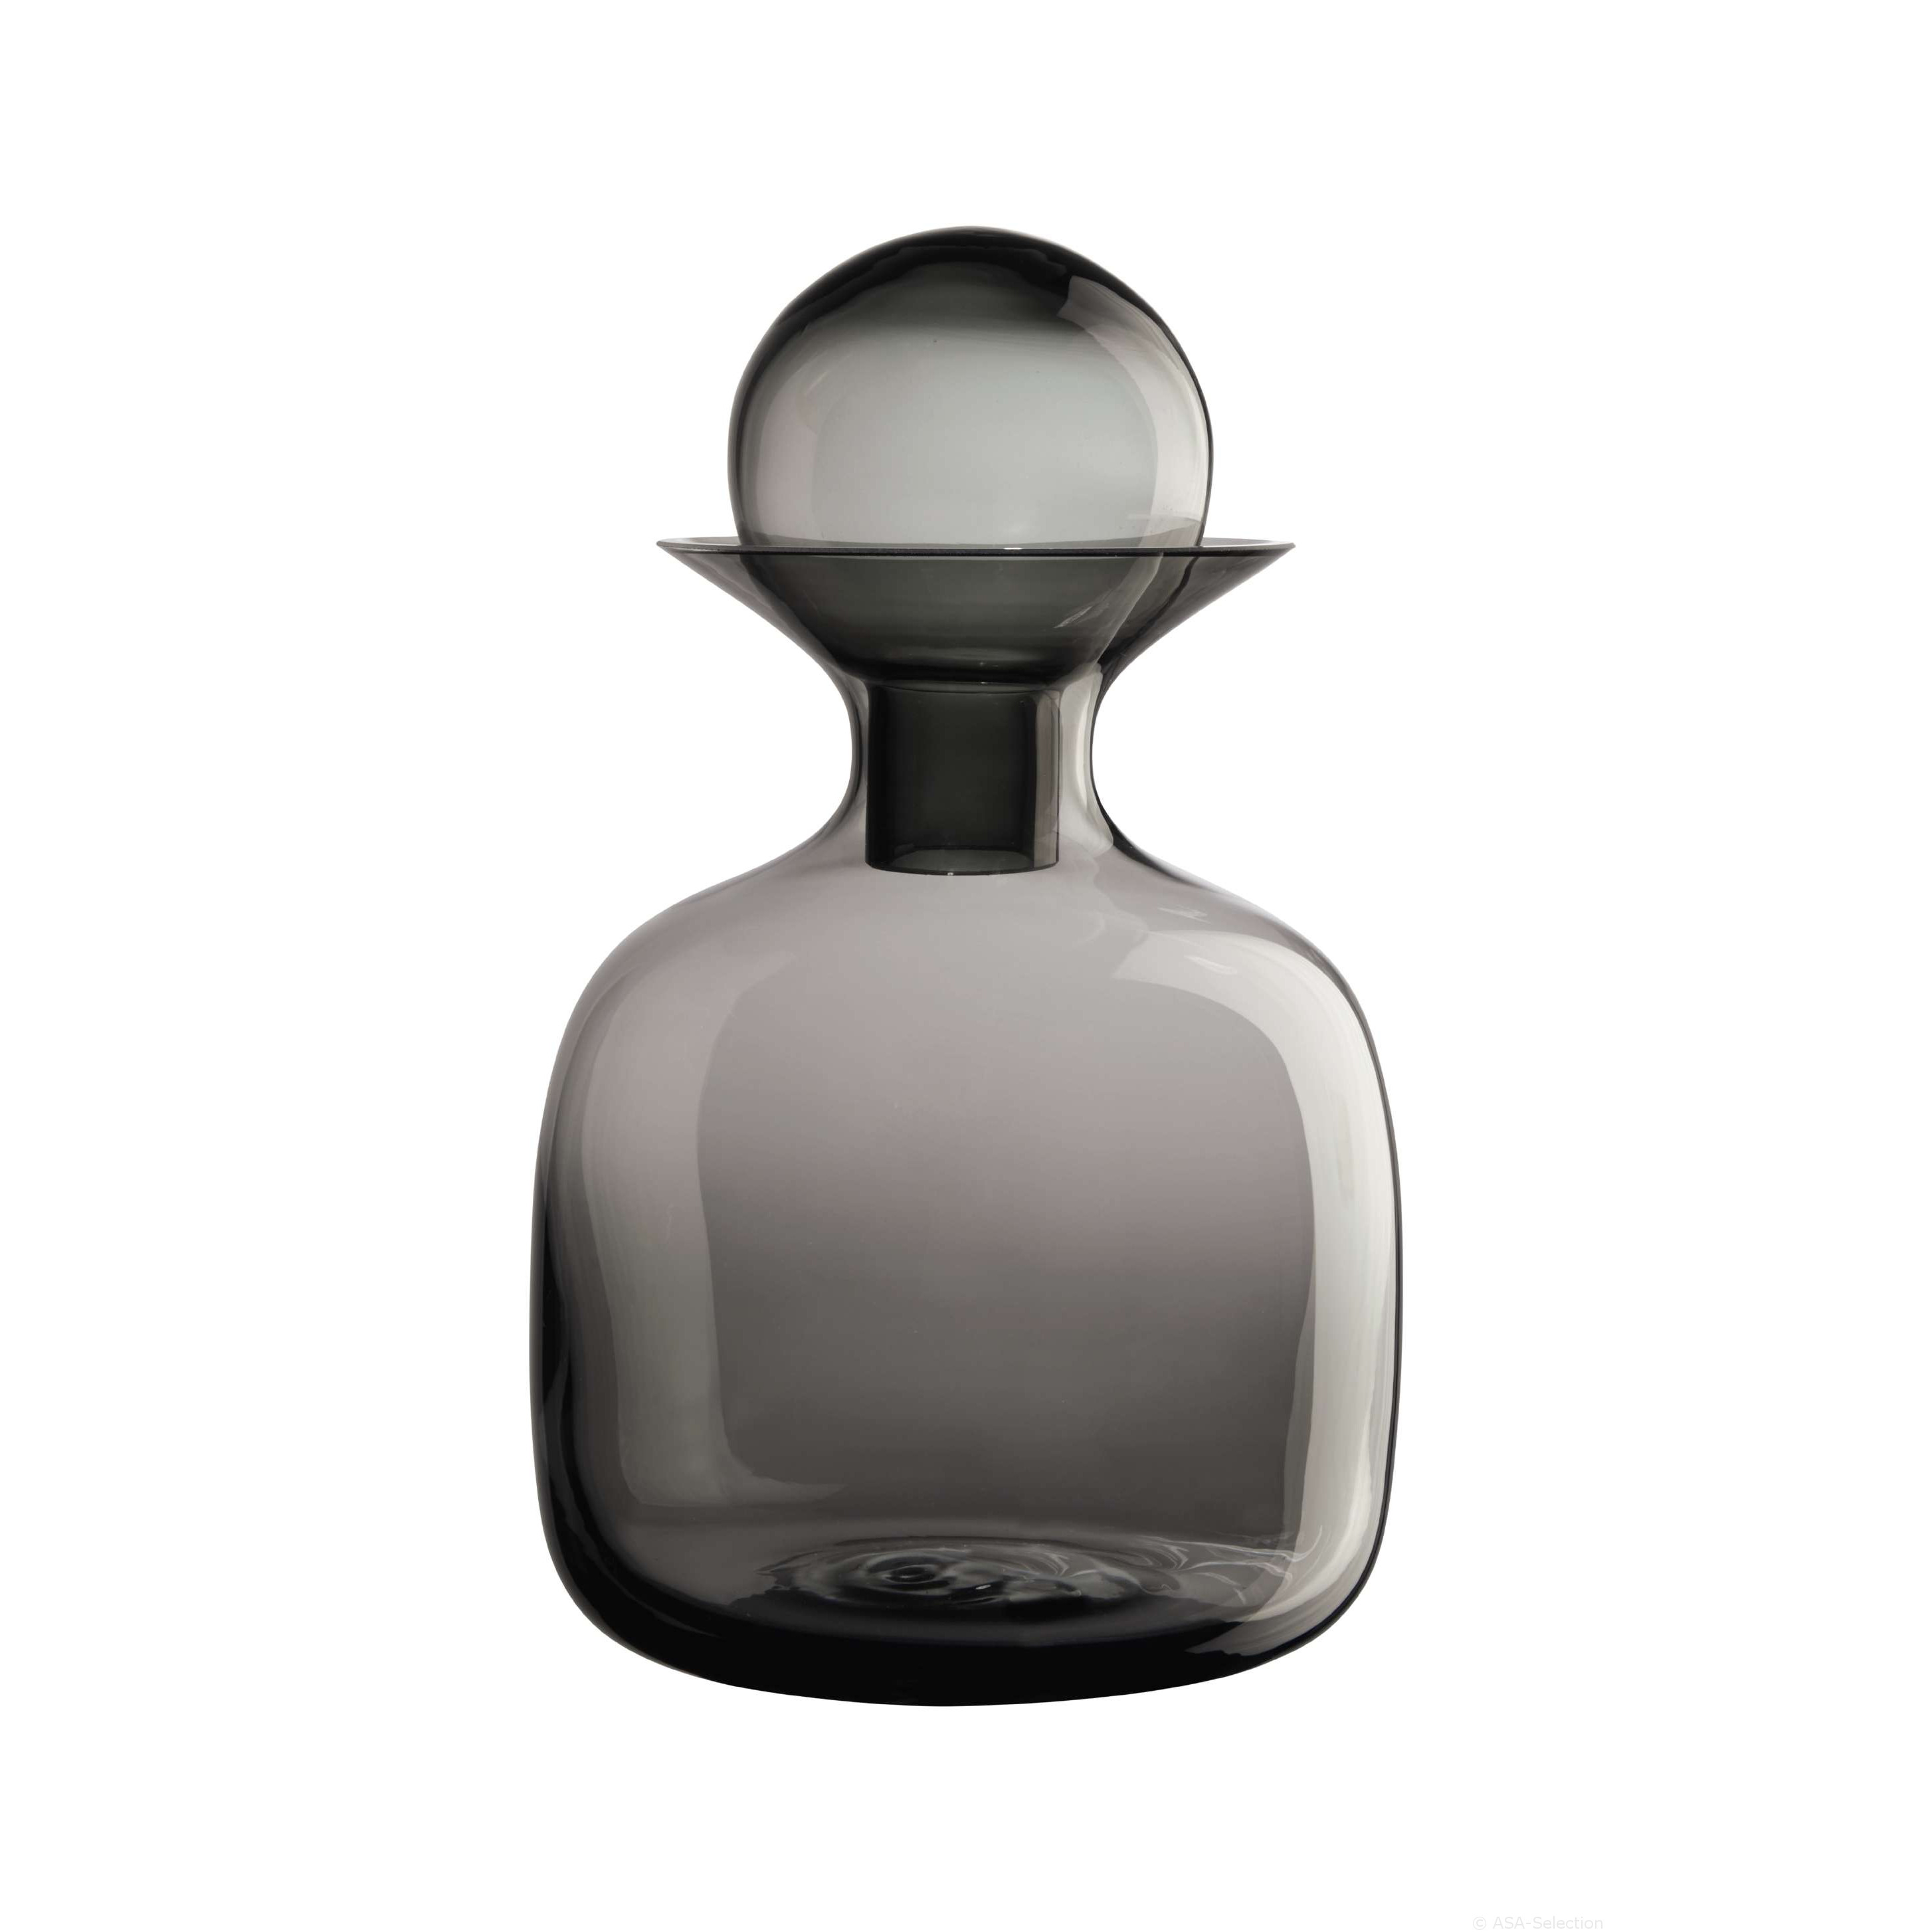 Karaffe 1.5L | Grau